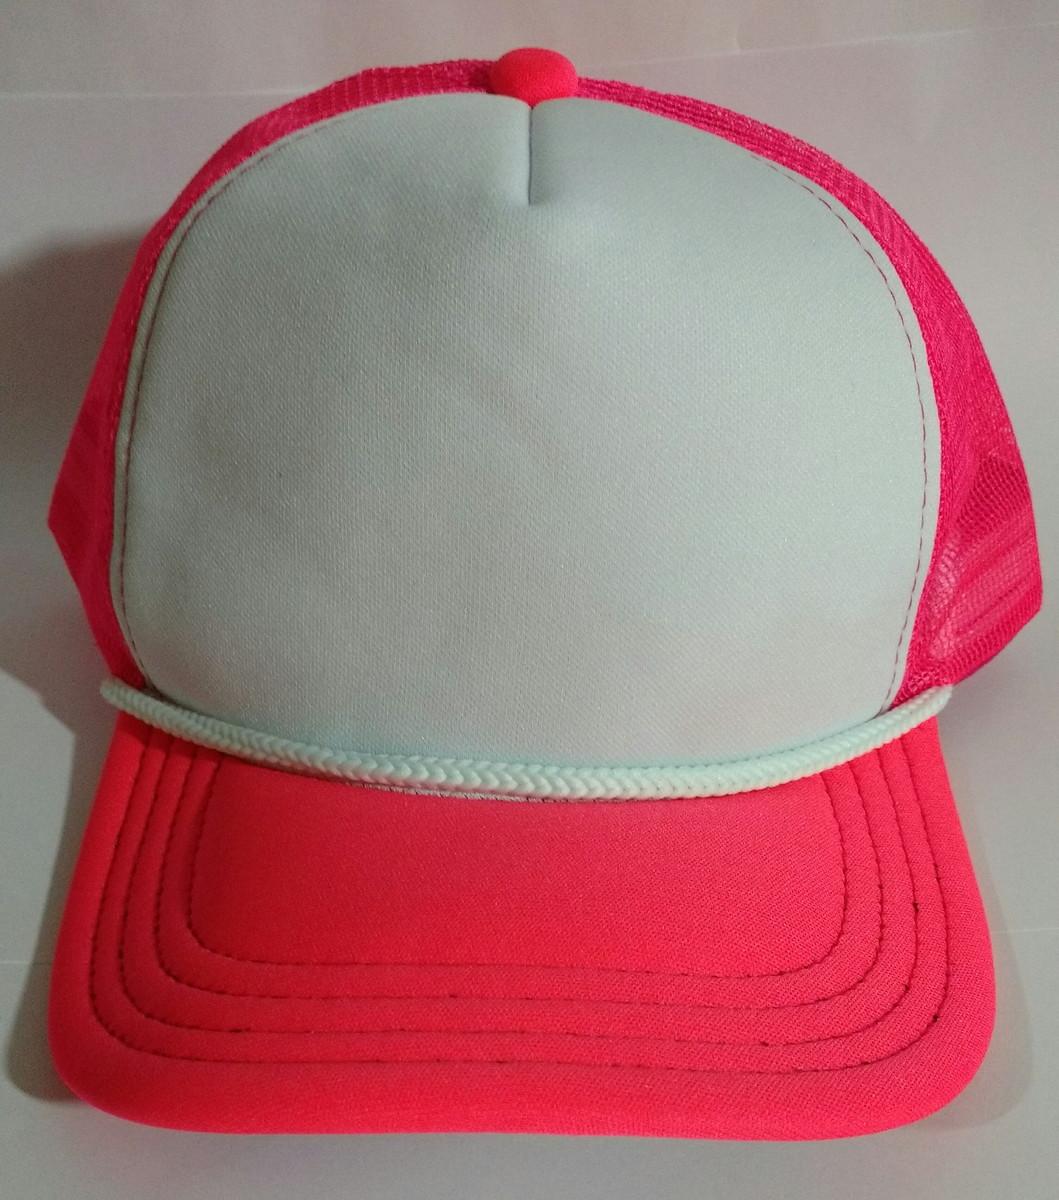 Boné Trucker Branco e Pink Personalizado no Elo7  b2eedf3b413